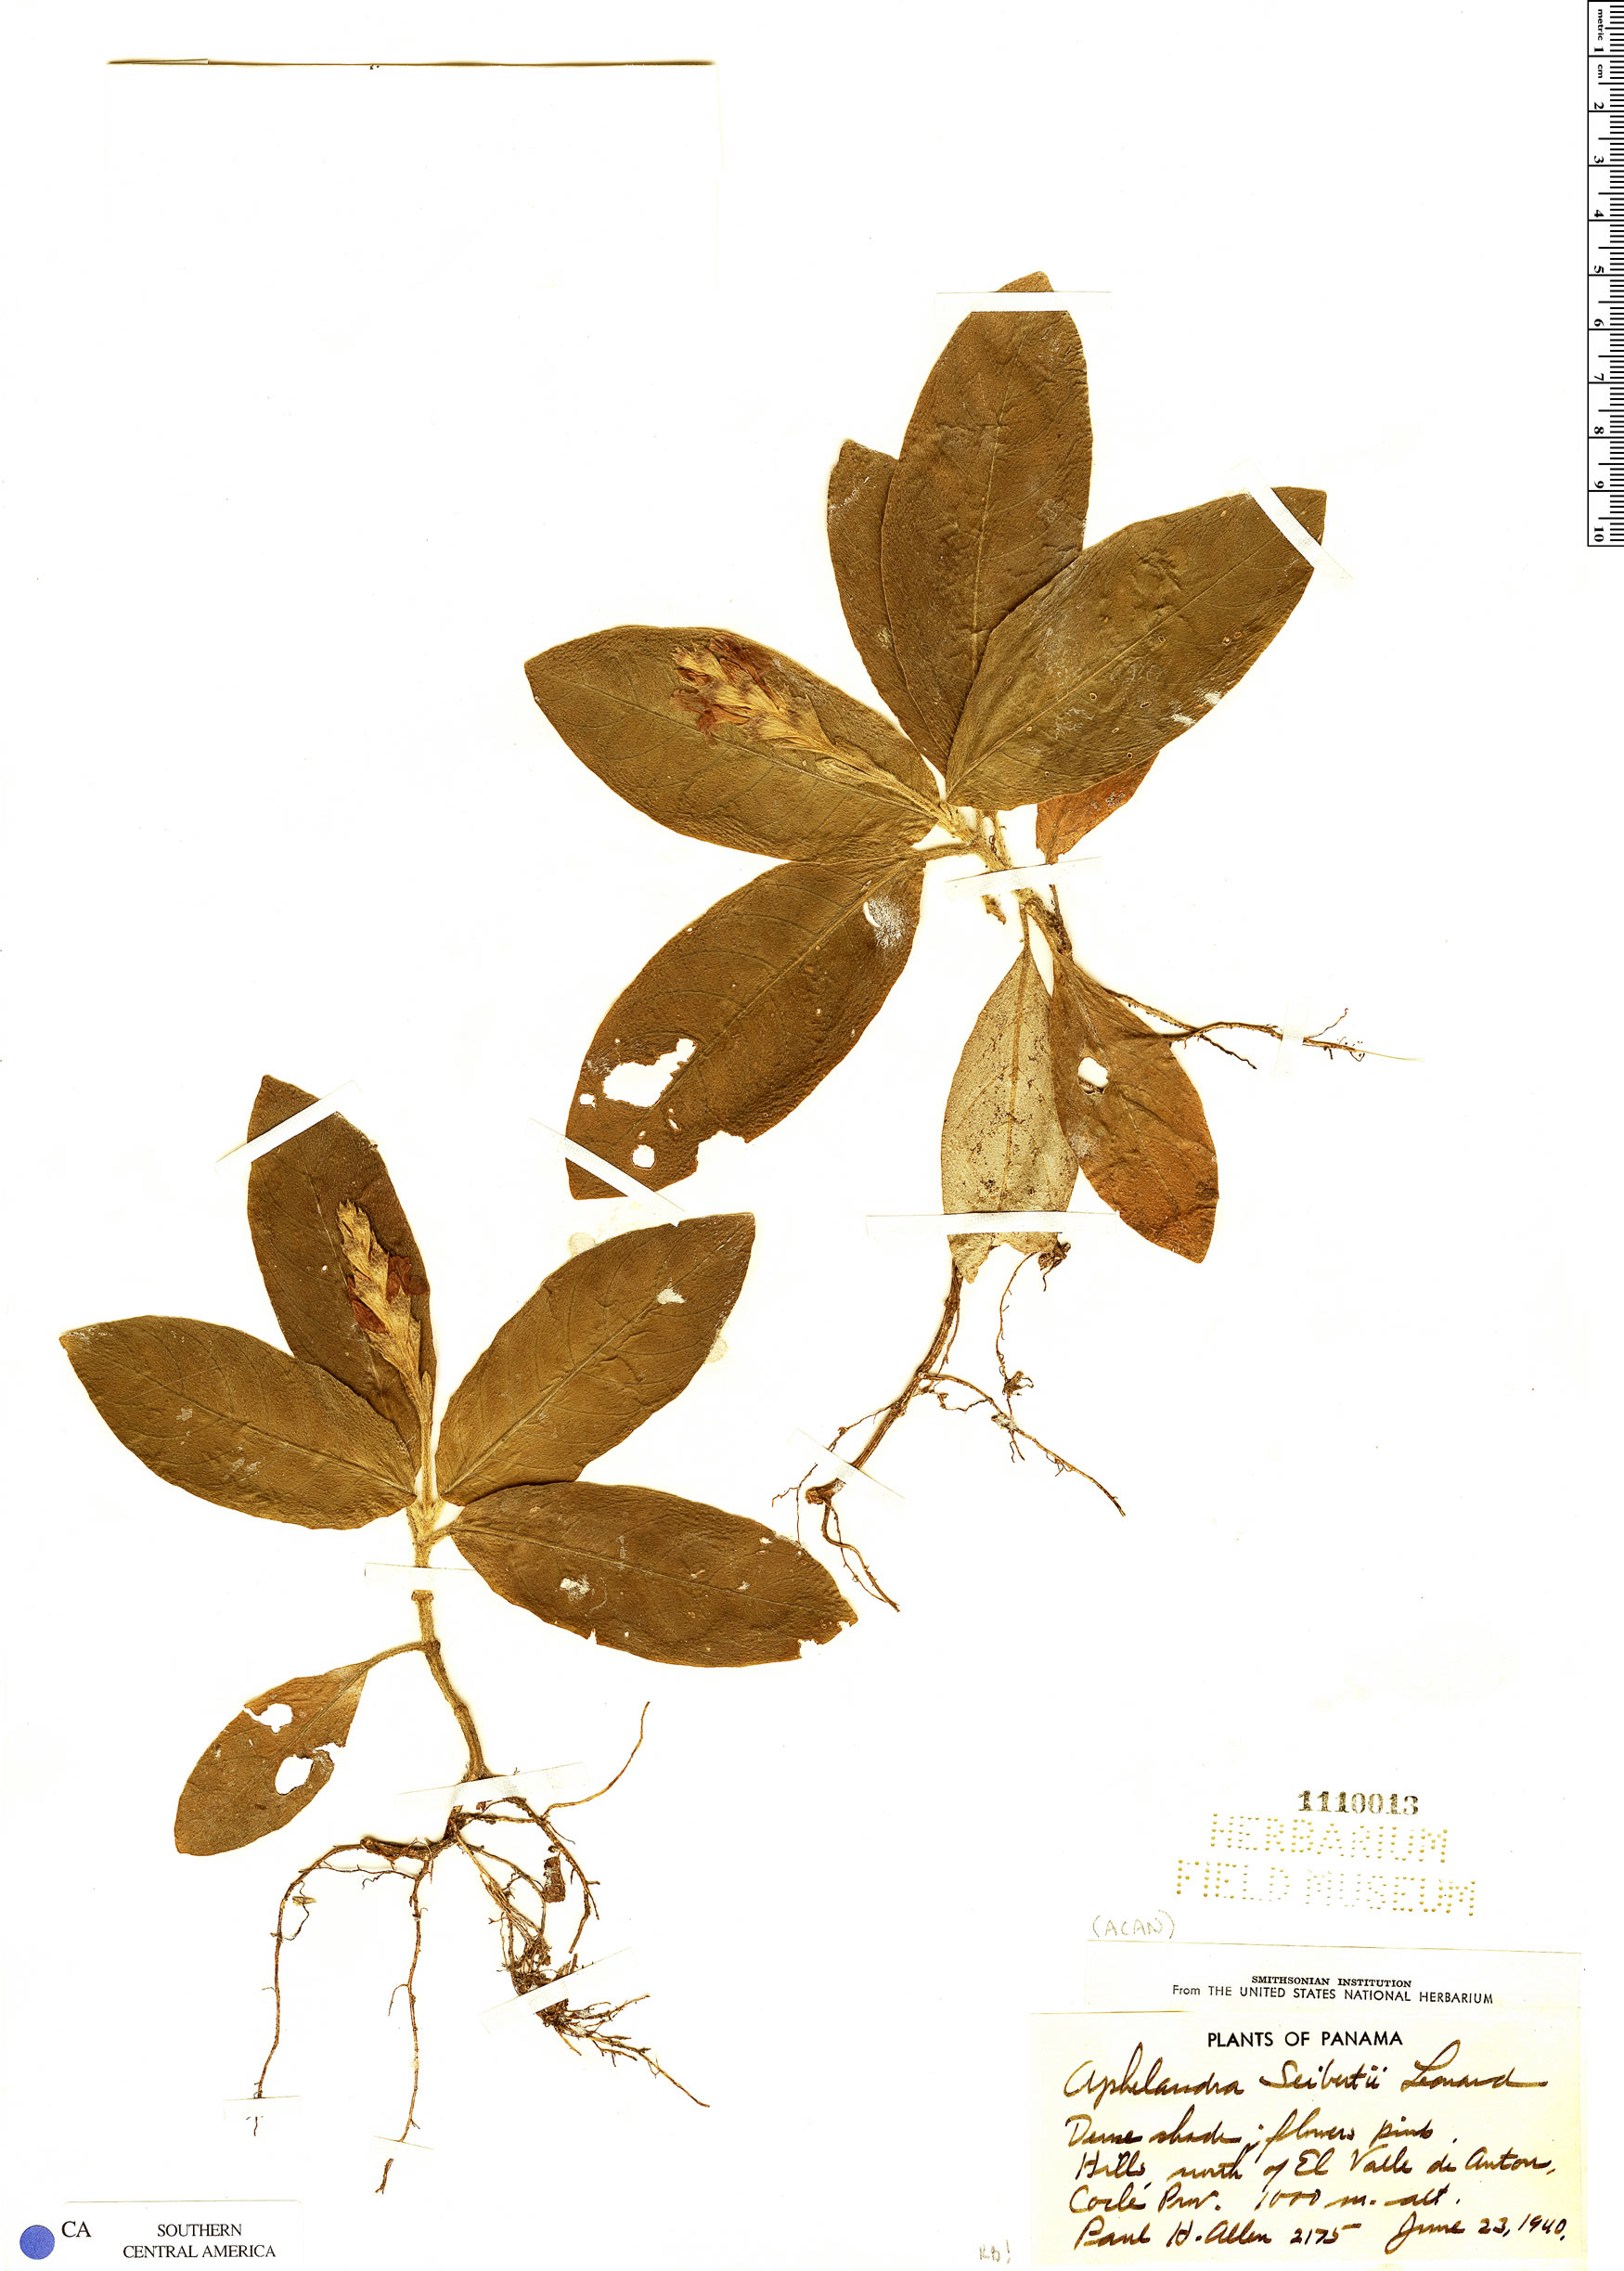 Specimen: Aphelandra seibertii